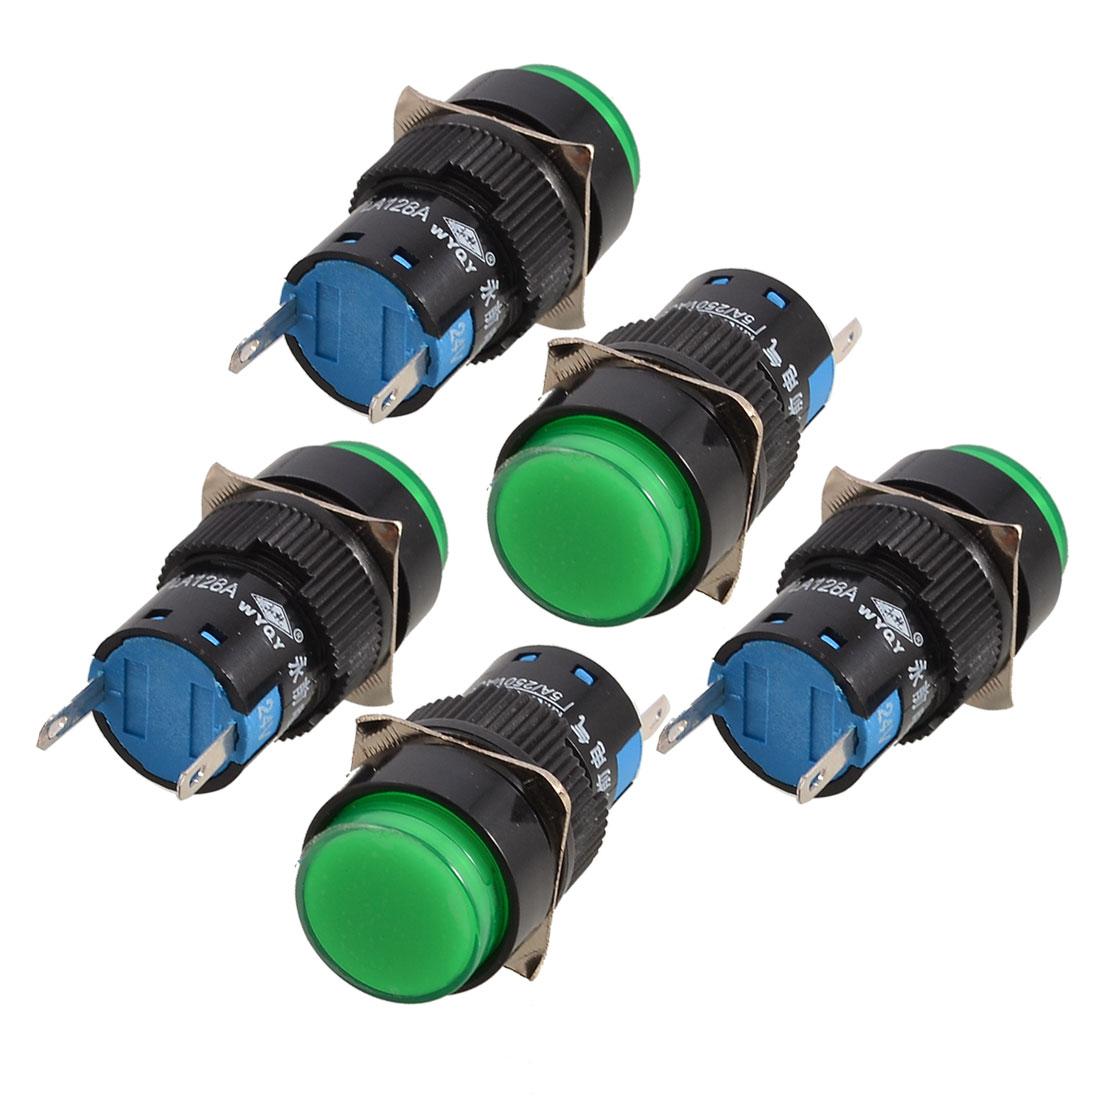 5 Pcs Green Round Cap 2 Terminals Fault Signal Lamp Indicator Light DC 24V